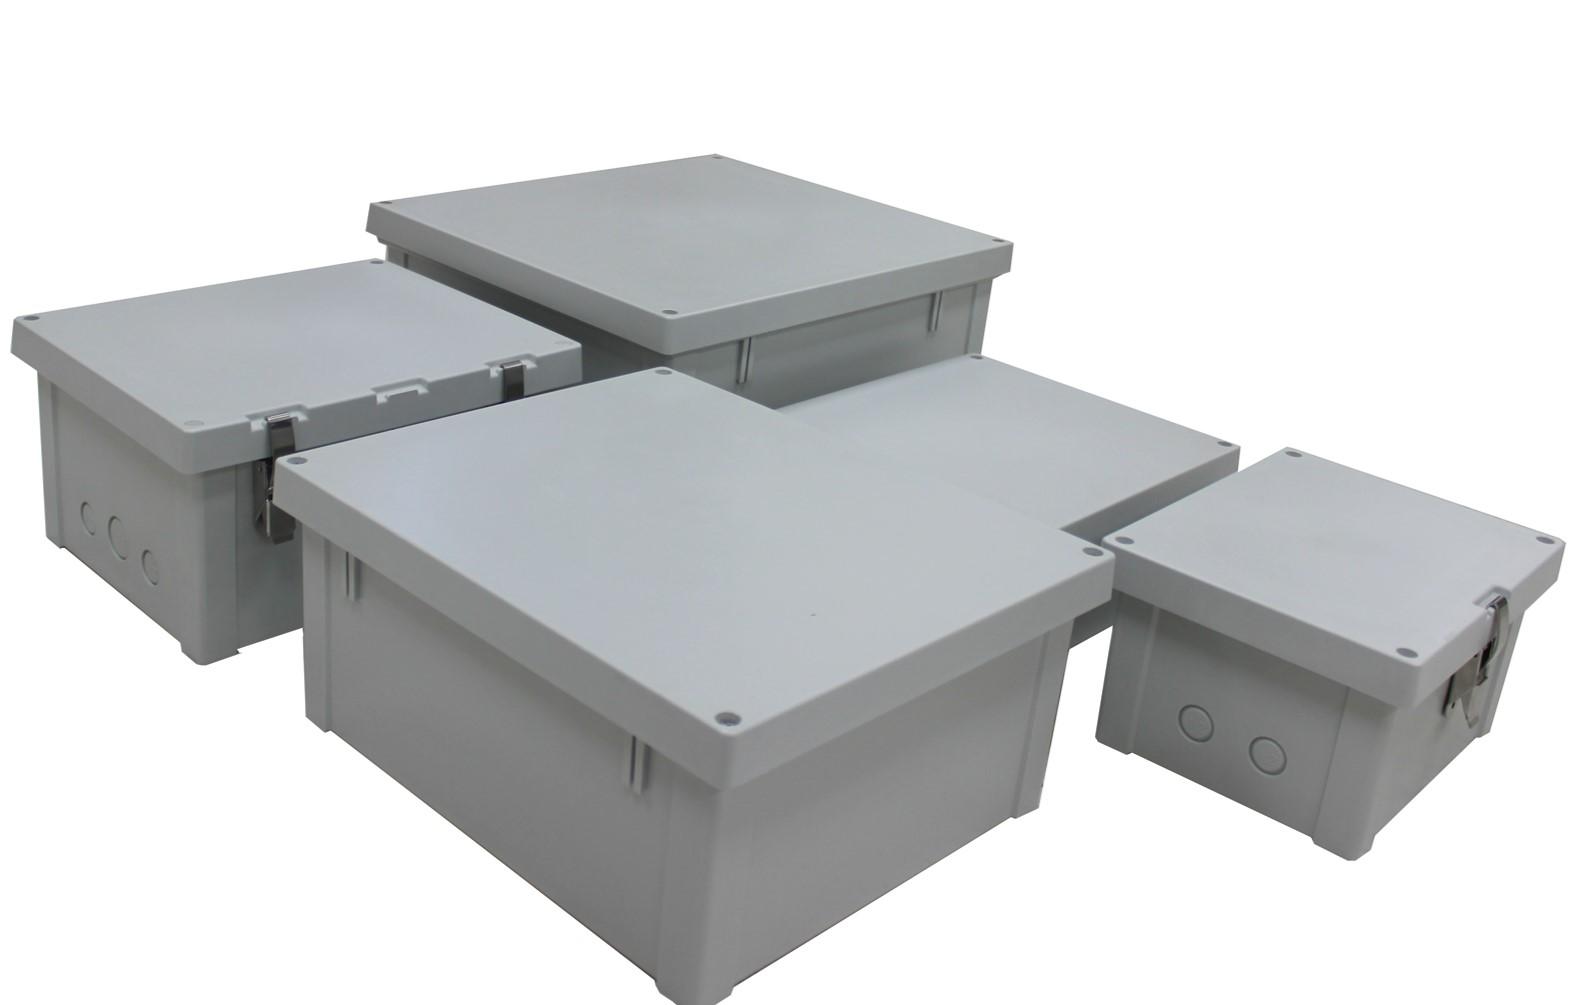 Flat cover nema 4 box